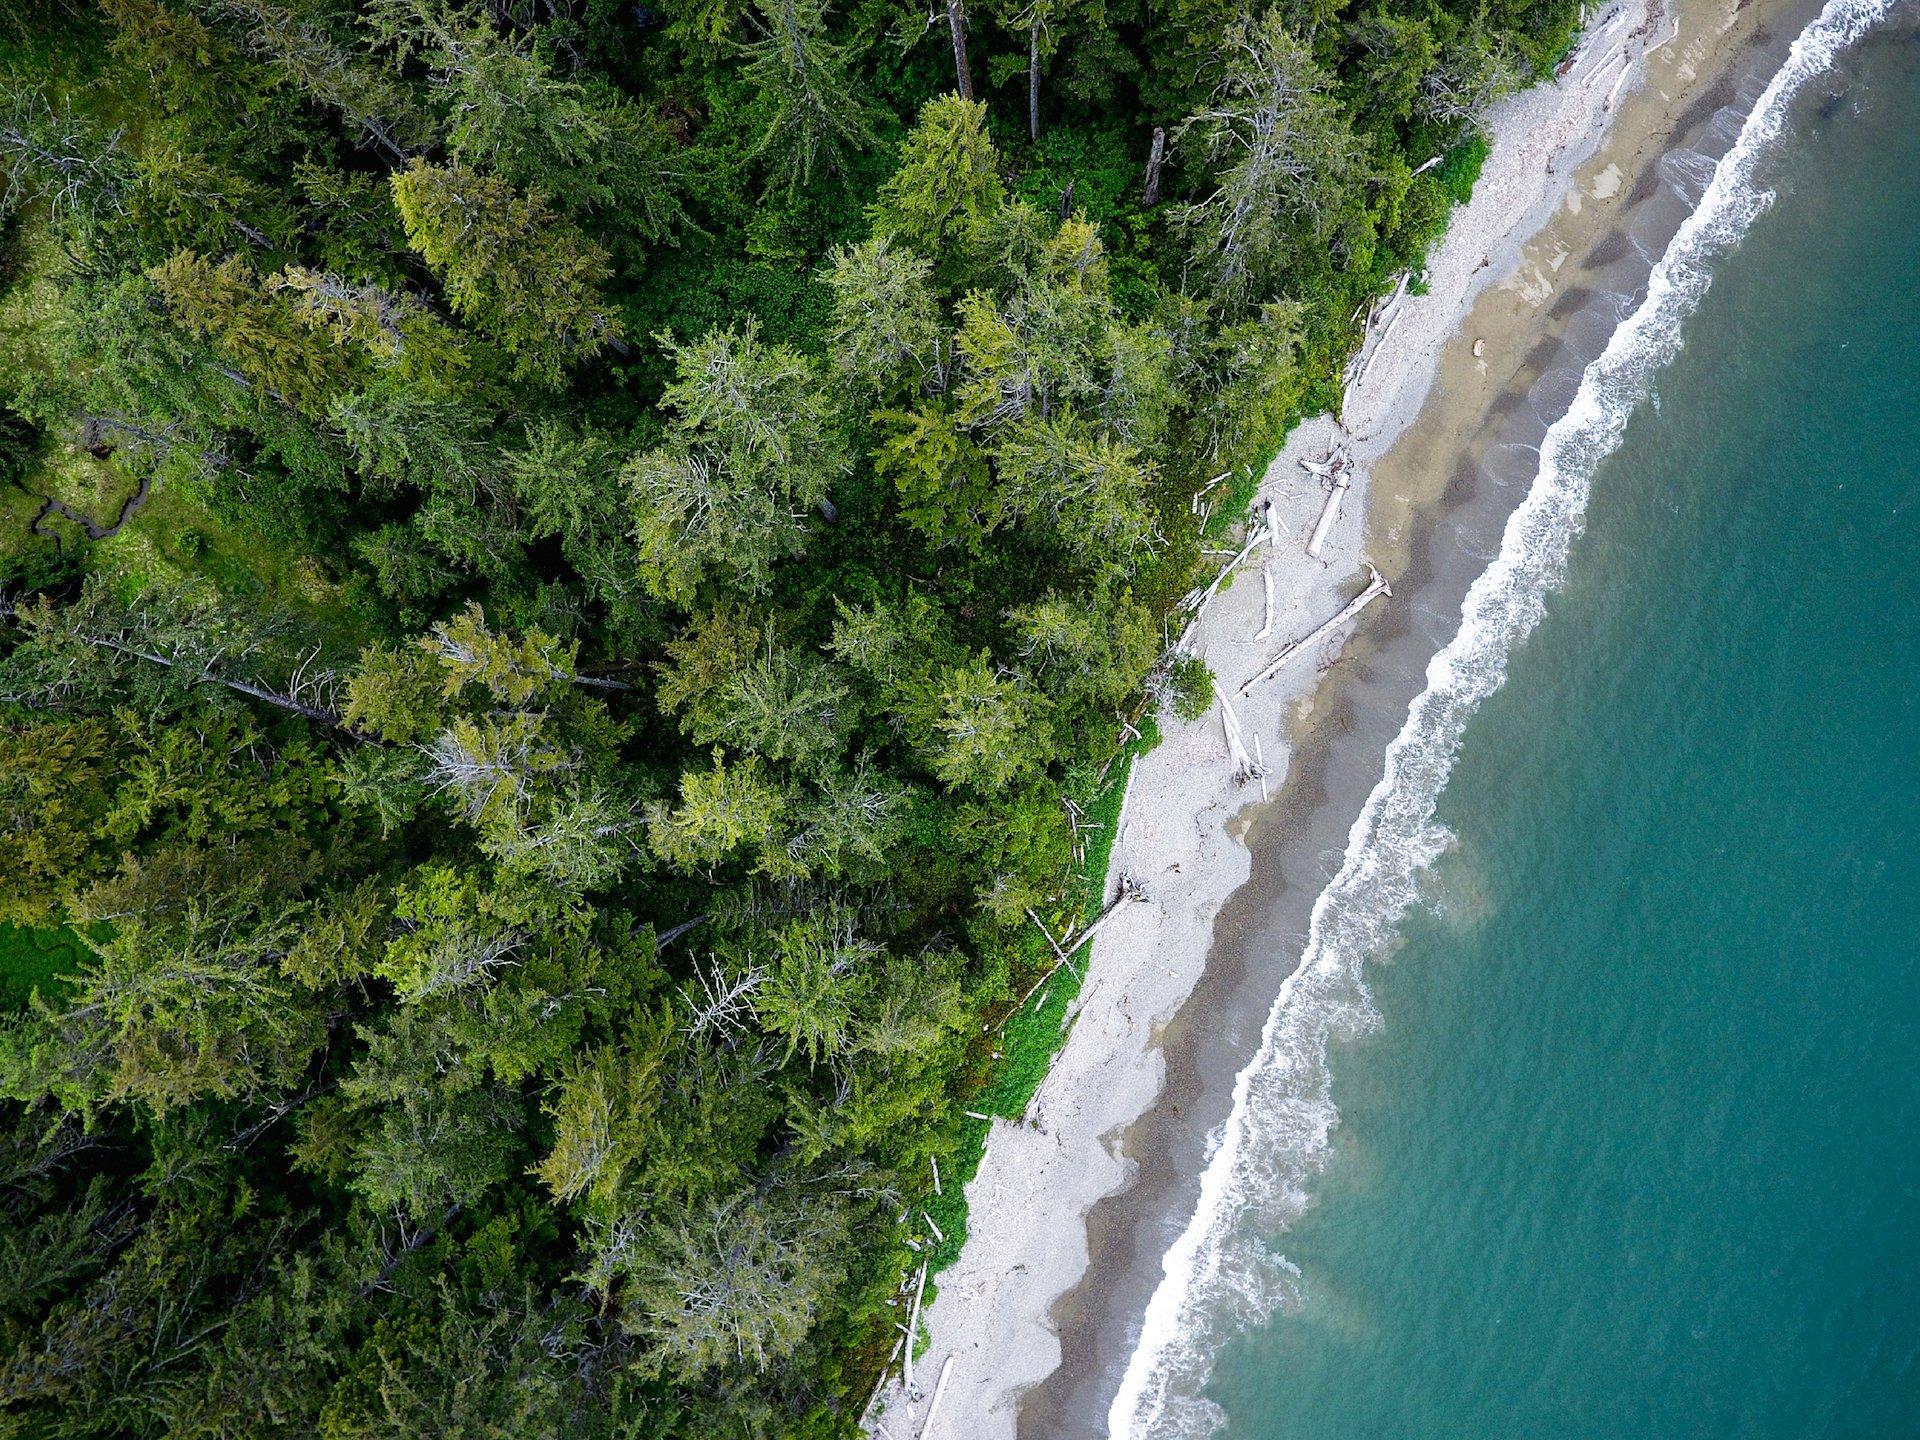 Aerial view of Rennell Sound coastline in Haida Gwaii